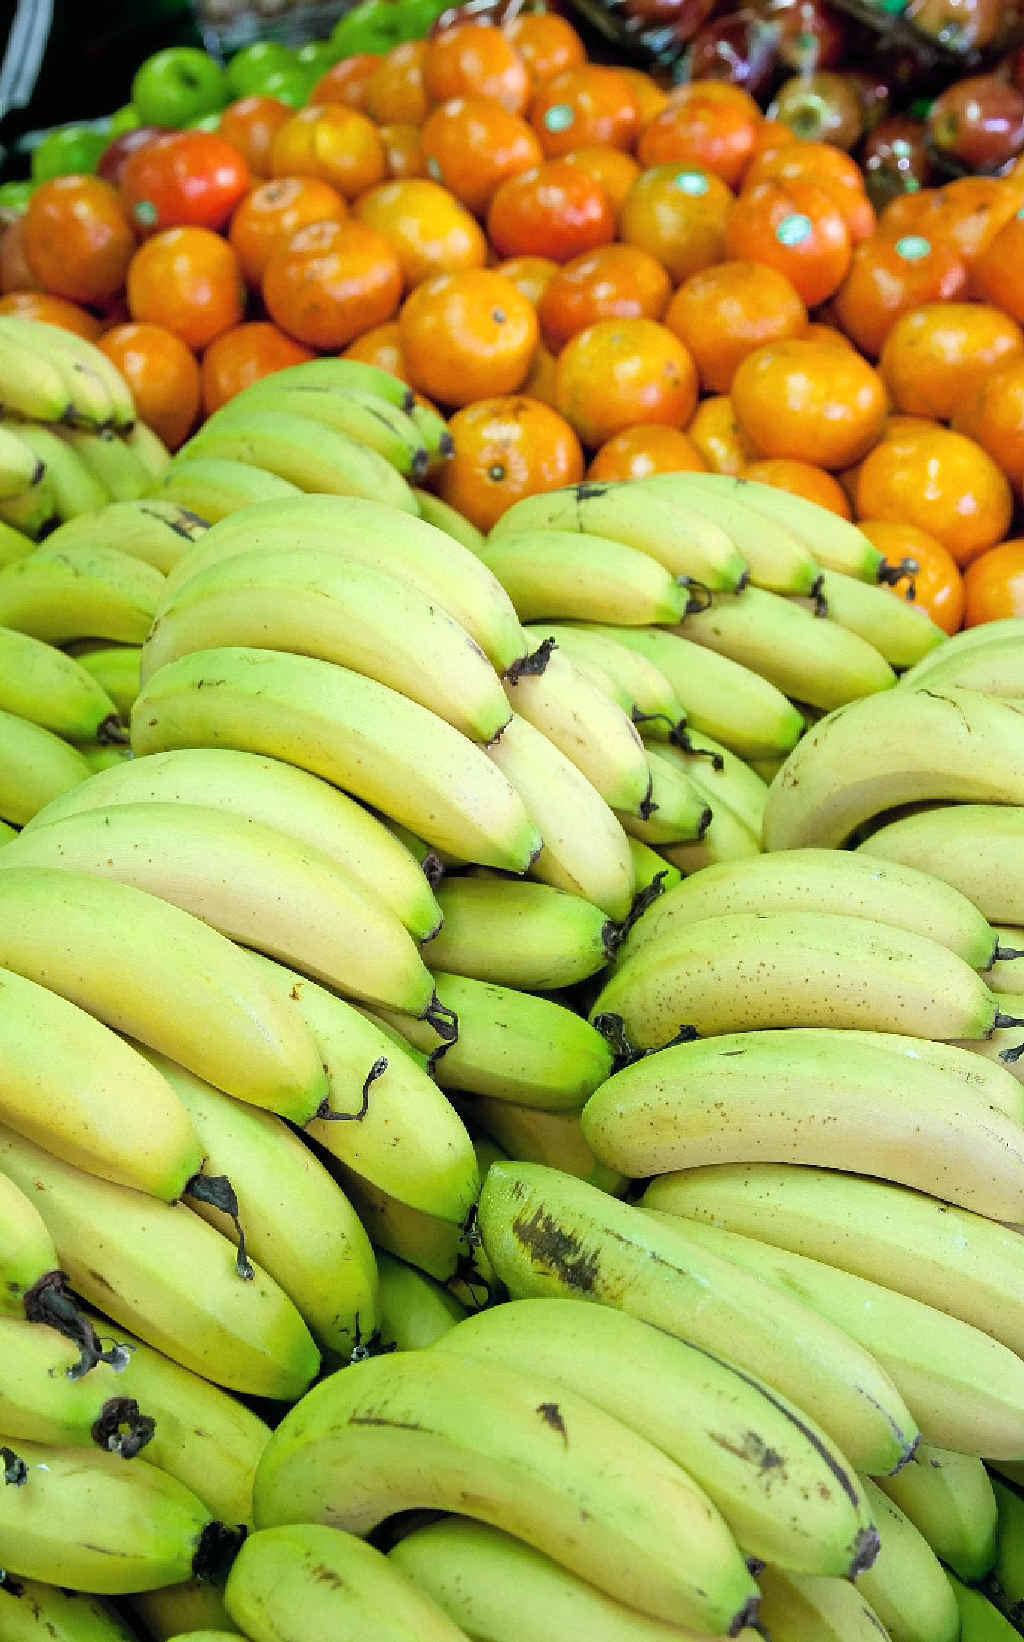 Not quite ripe bananas keep longer